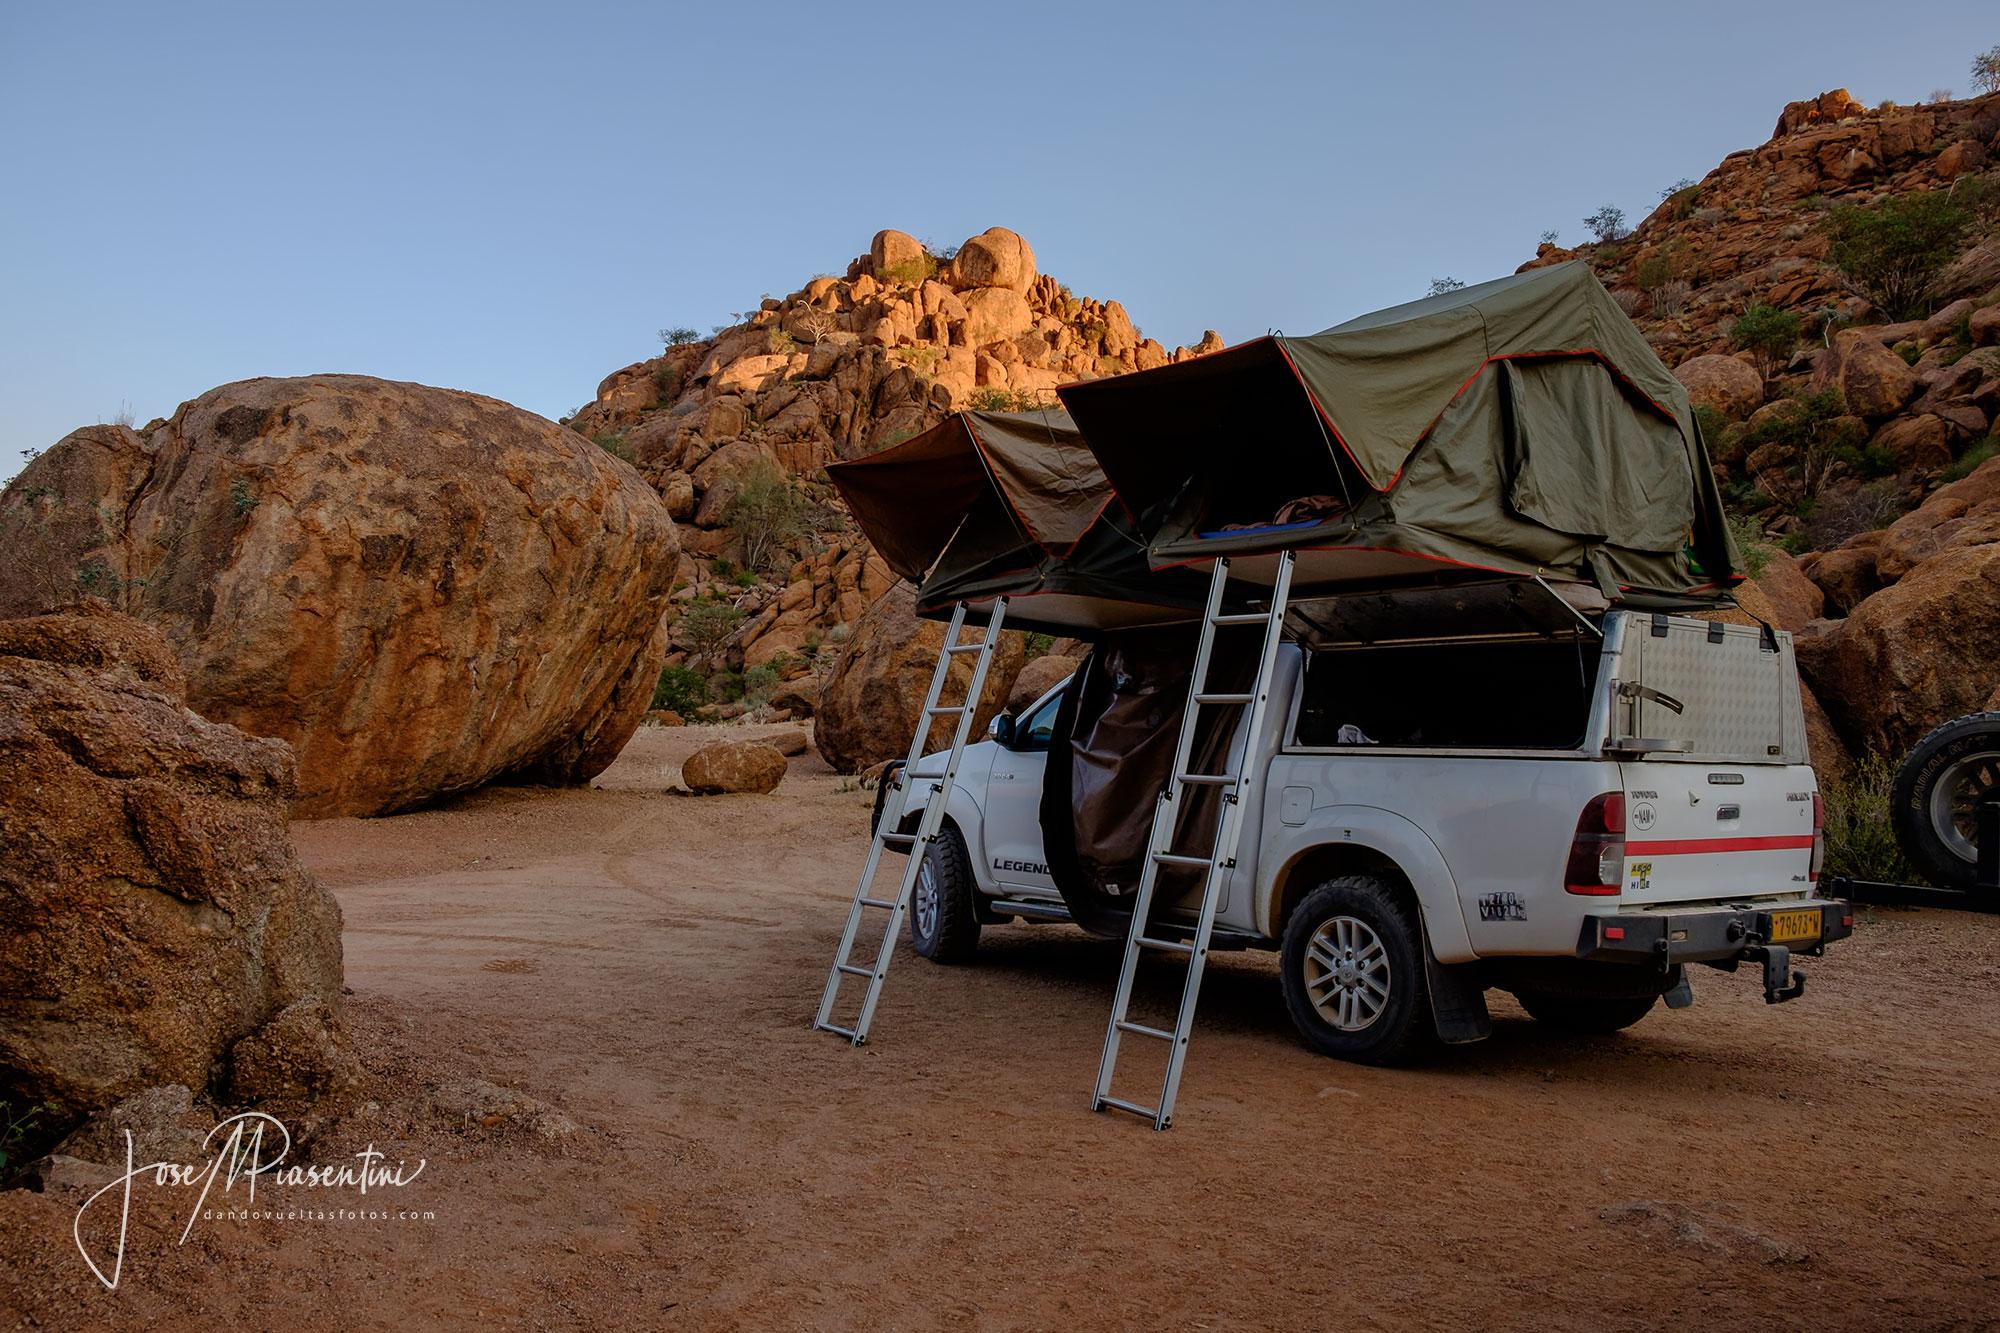 sunset-Mowani-Camp-Twyfelfontein